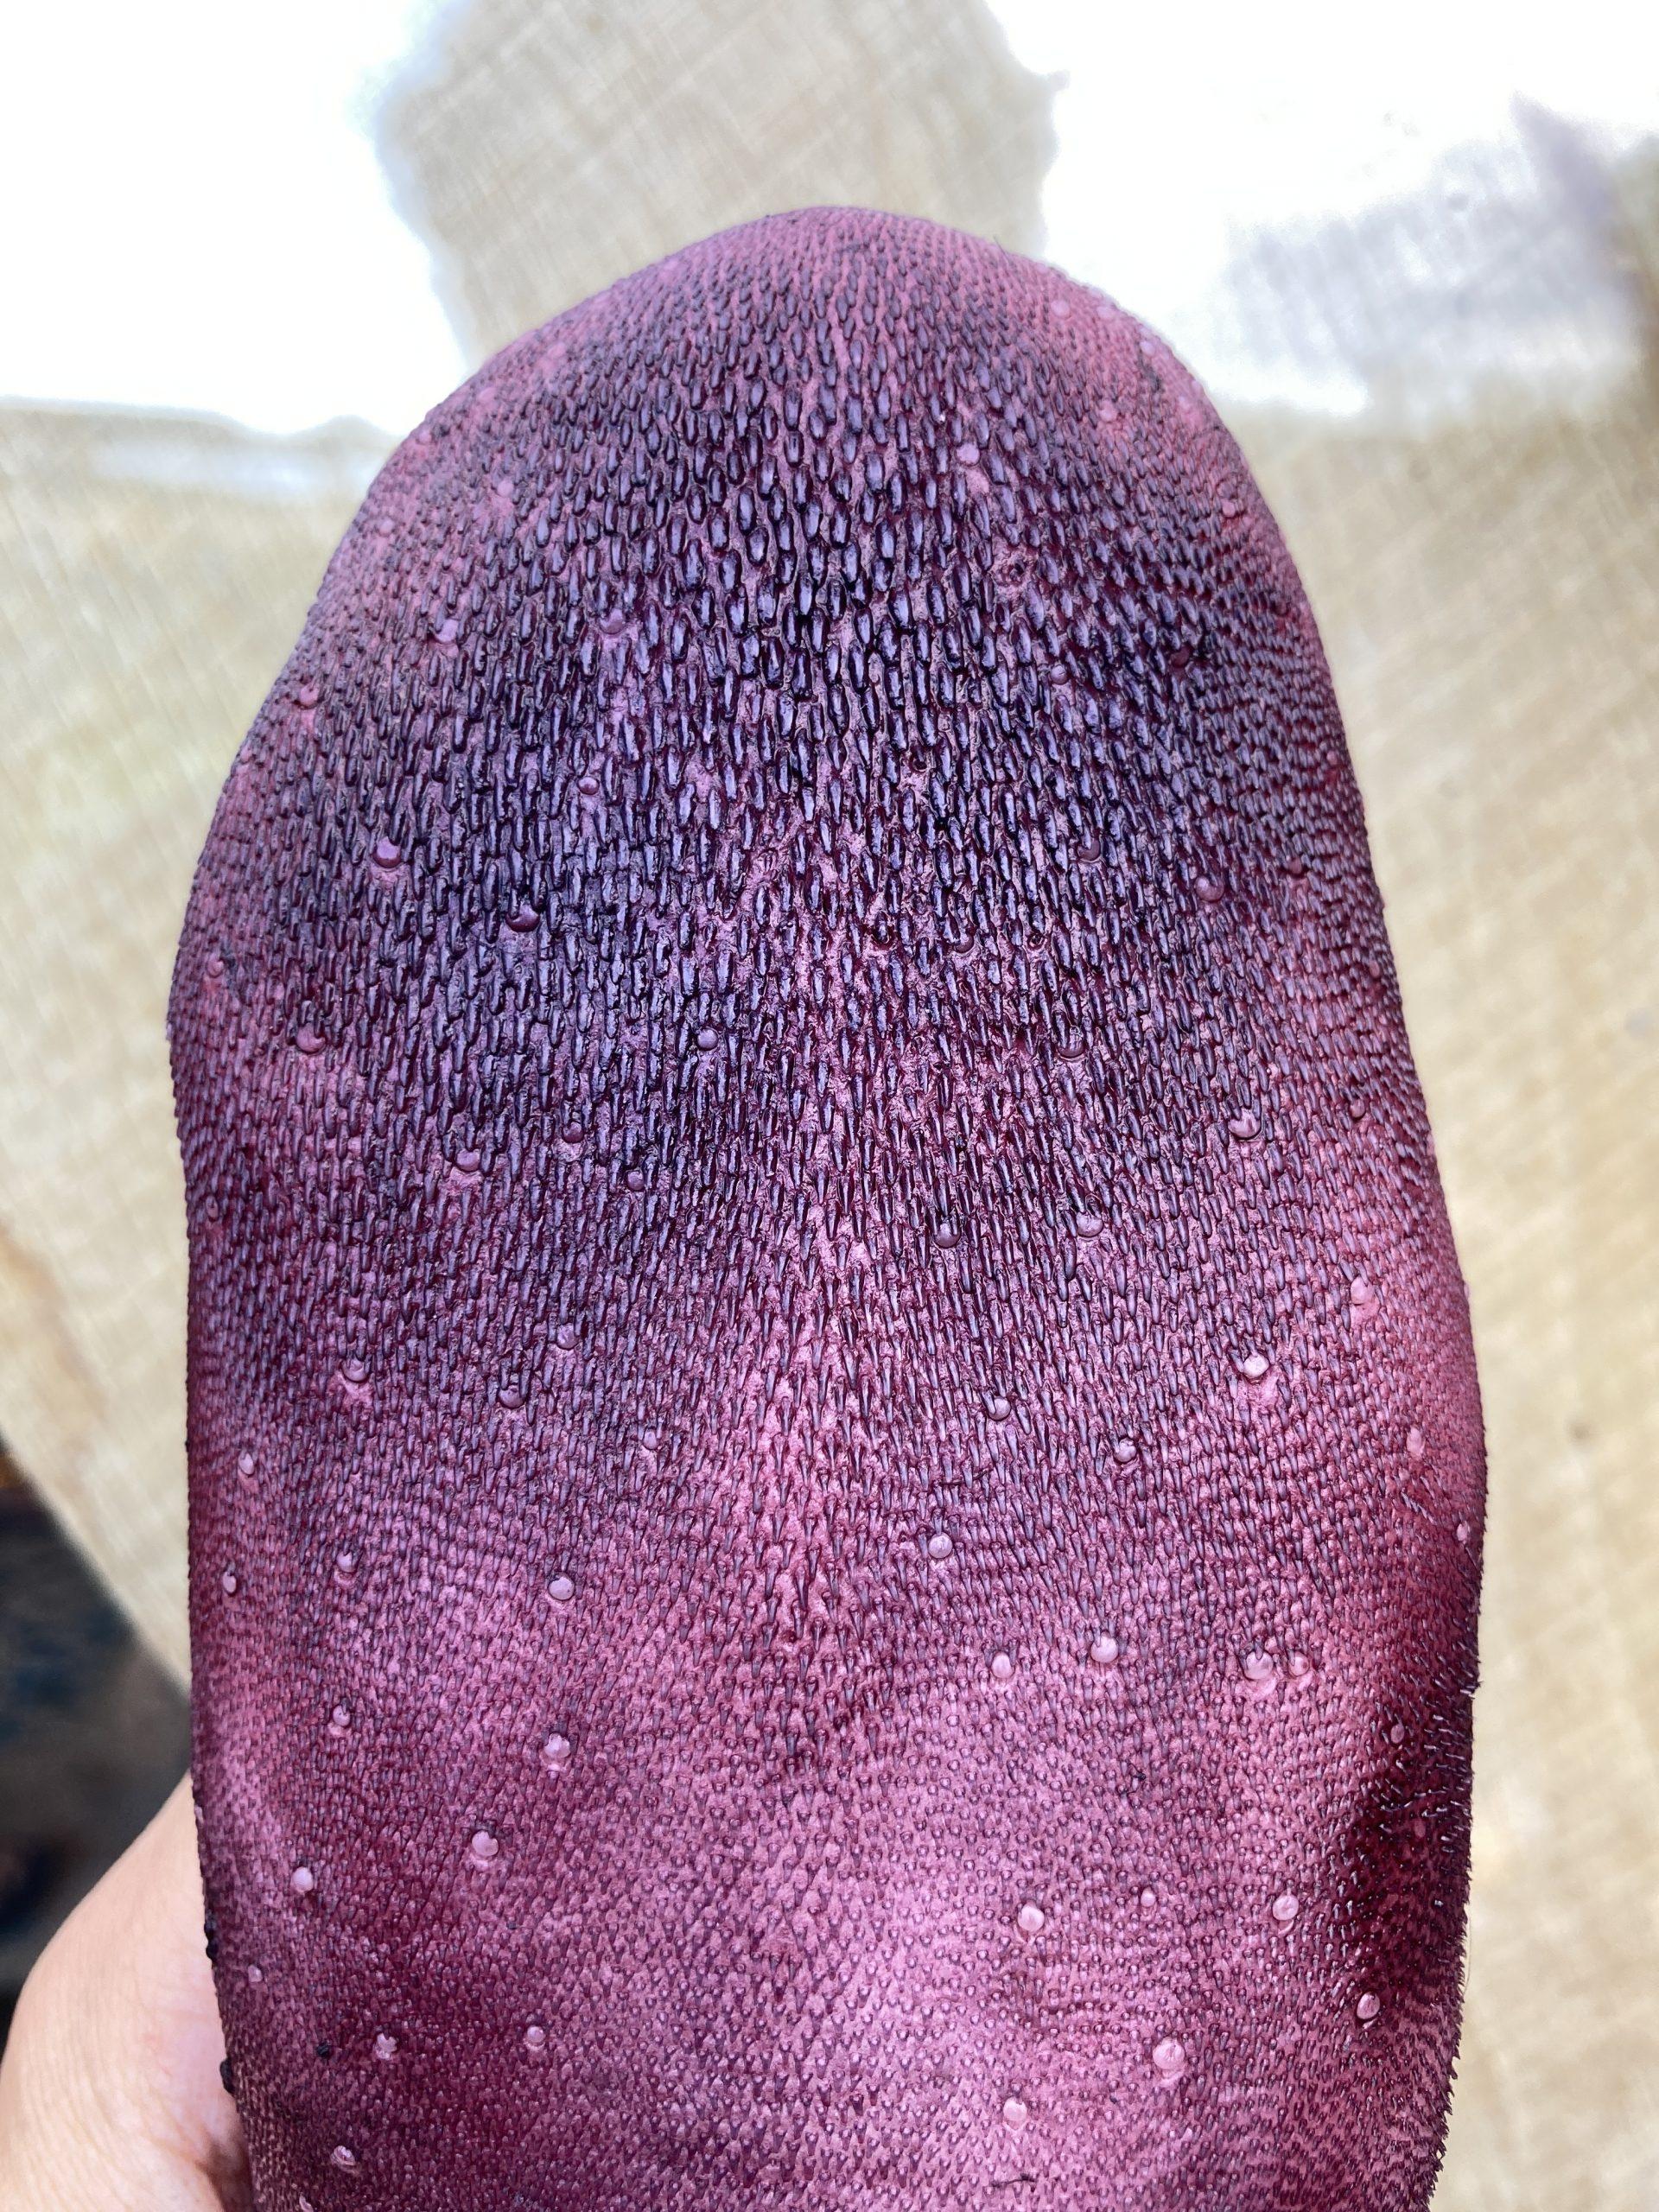 Litmus tongue